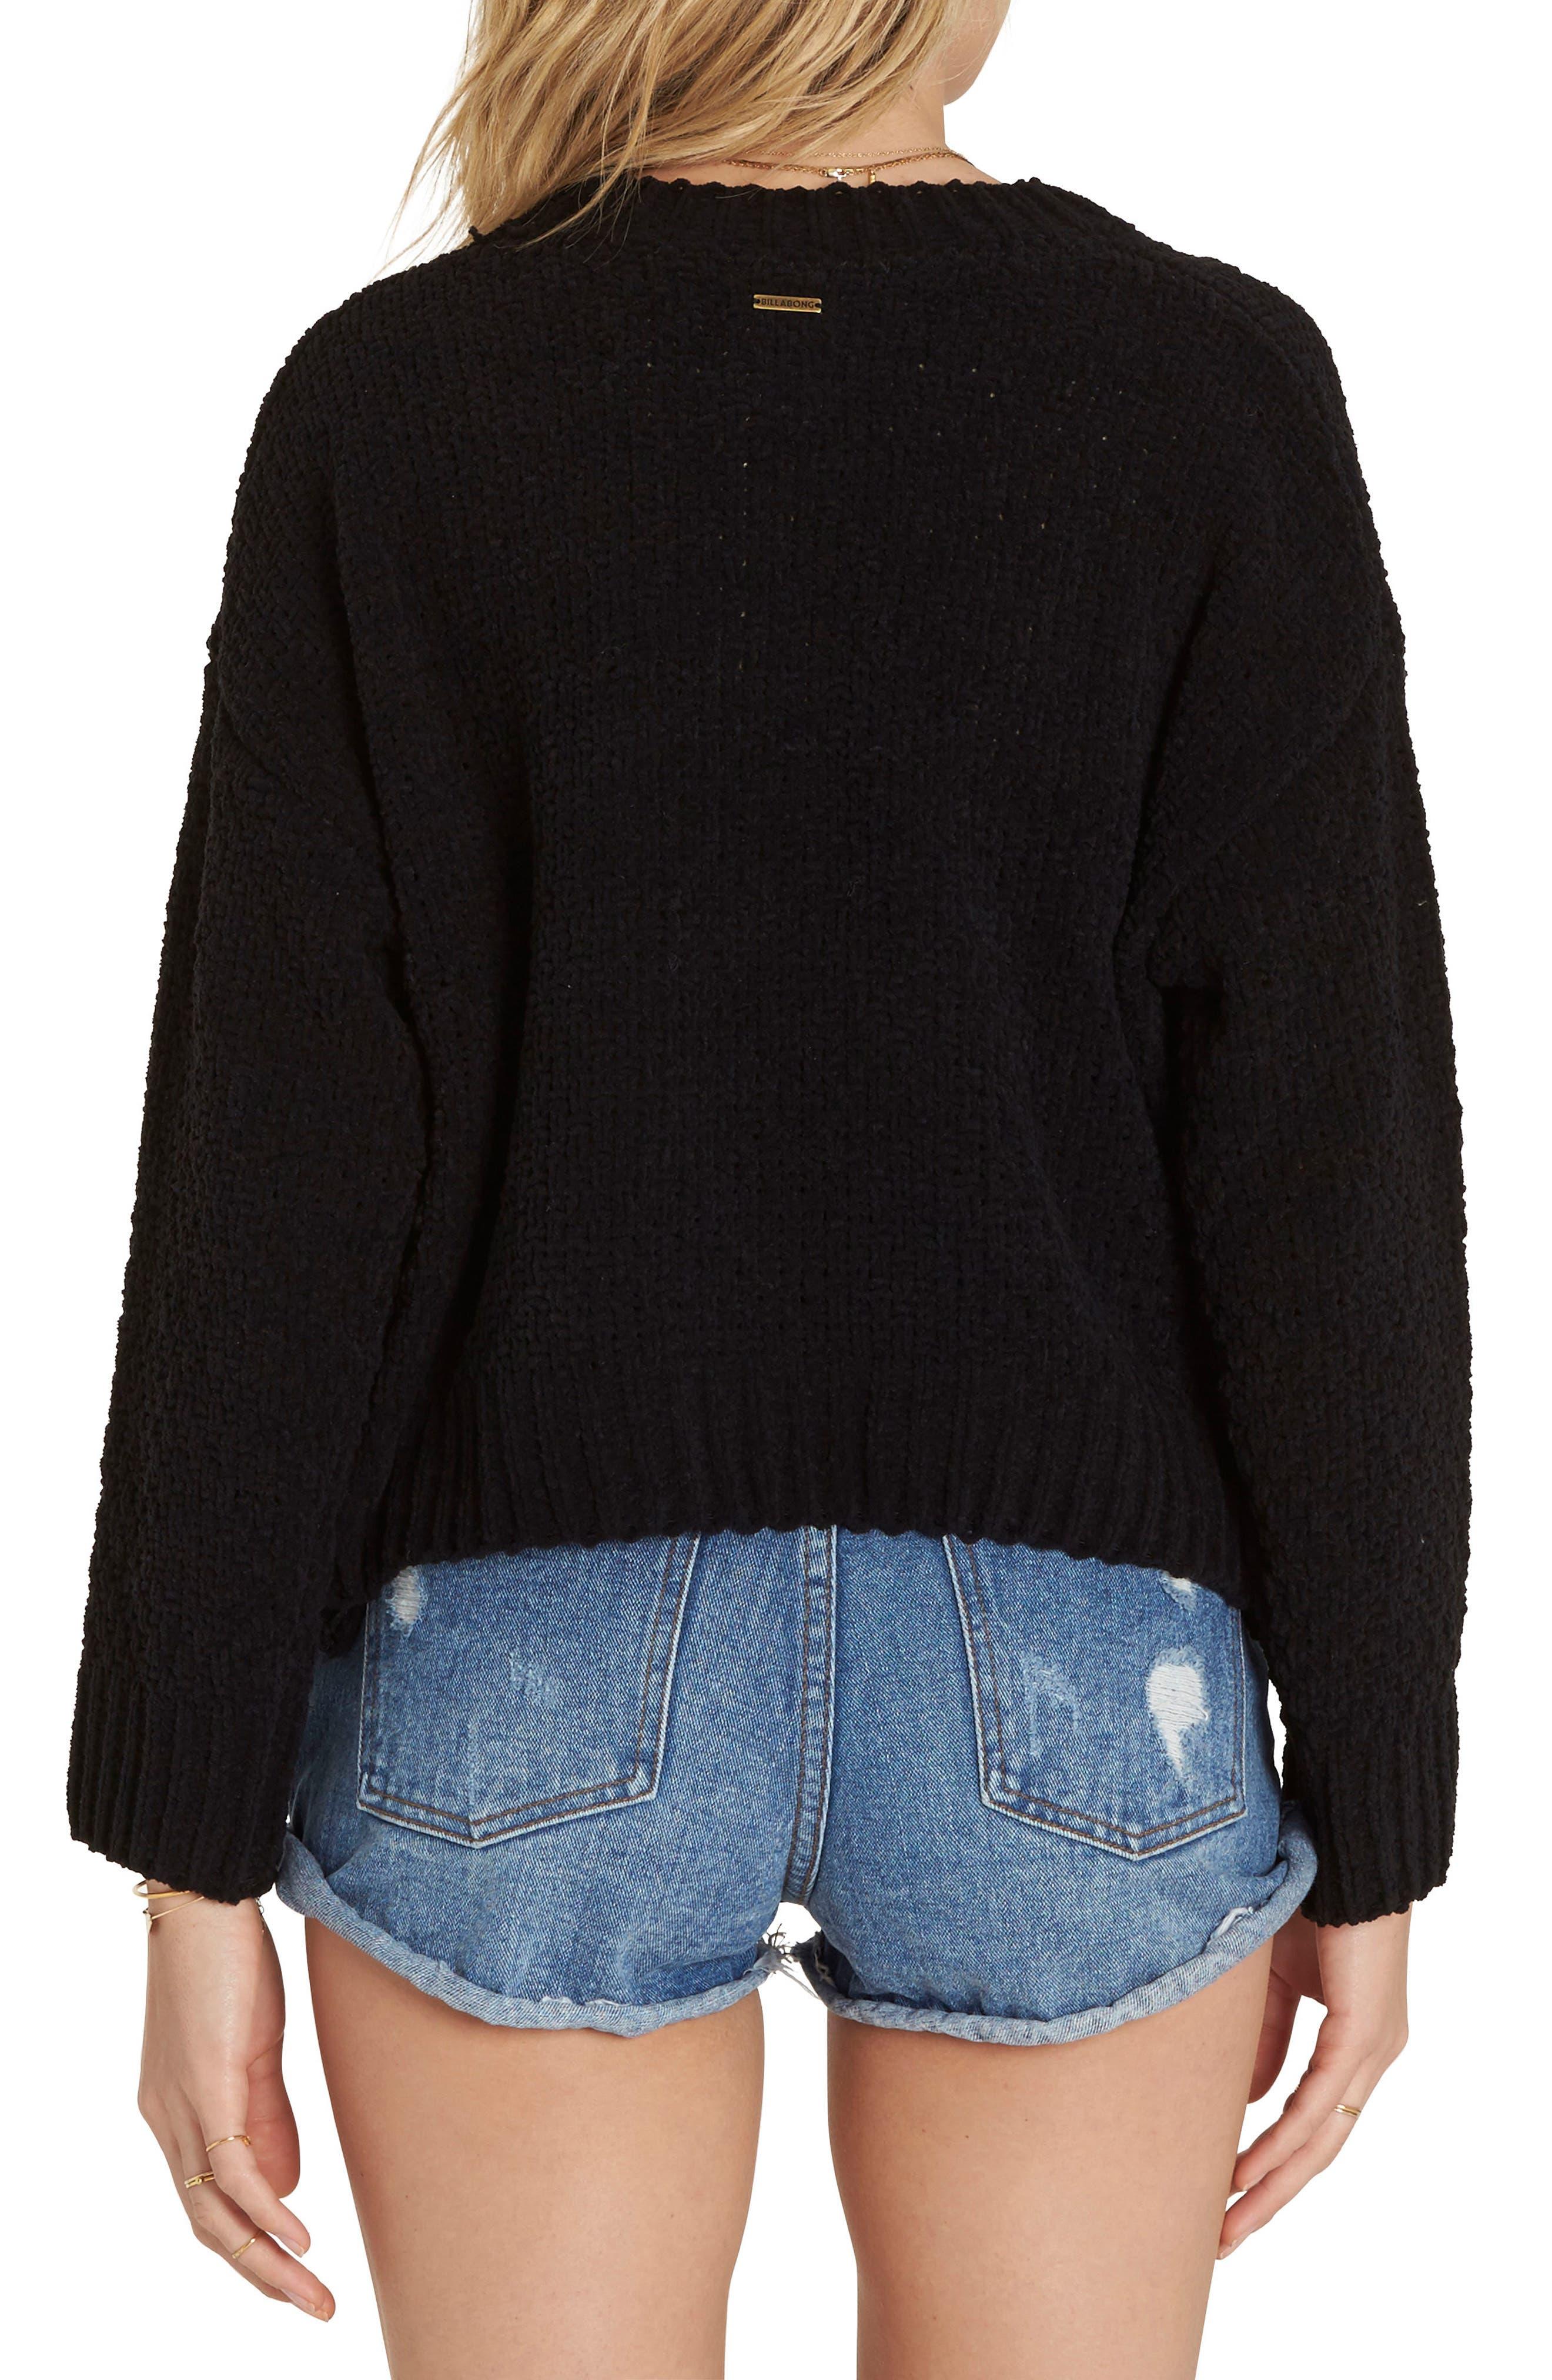 All Mine Chenille Sweater,                             Alternate thumbnail 2, color,                             001